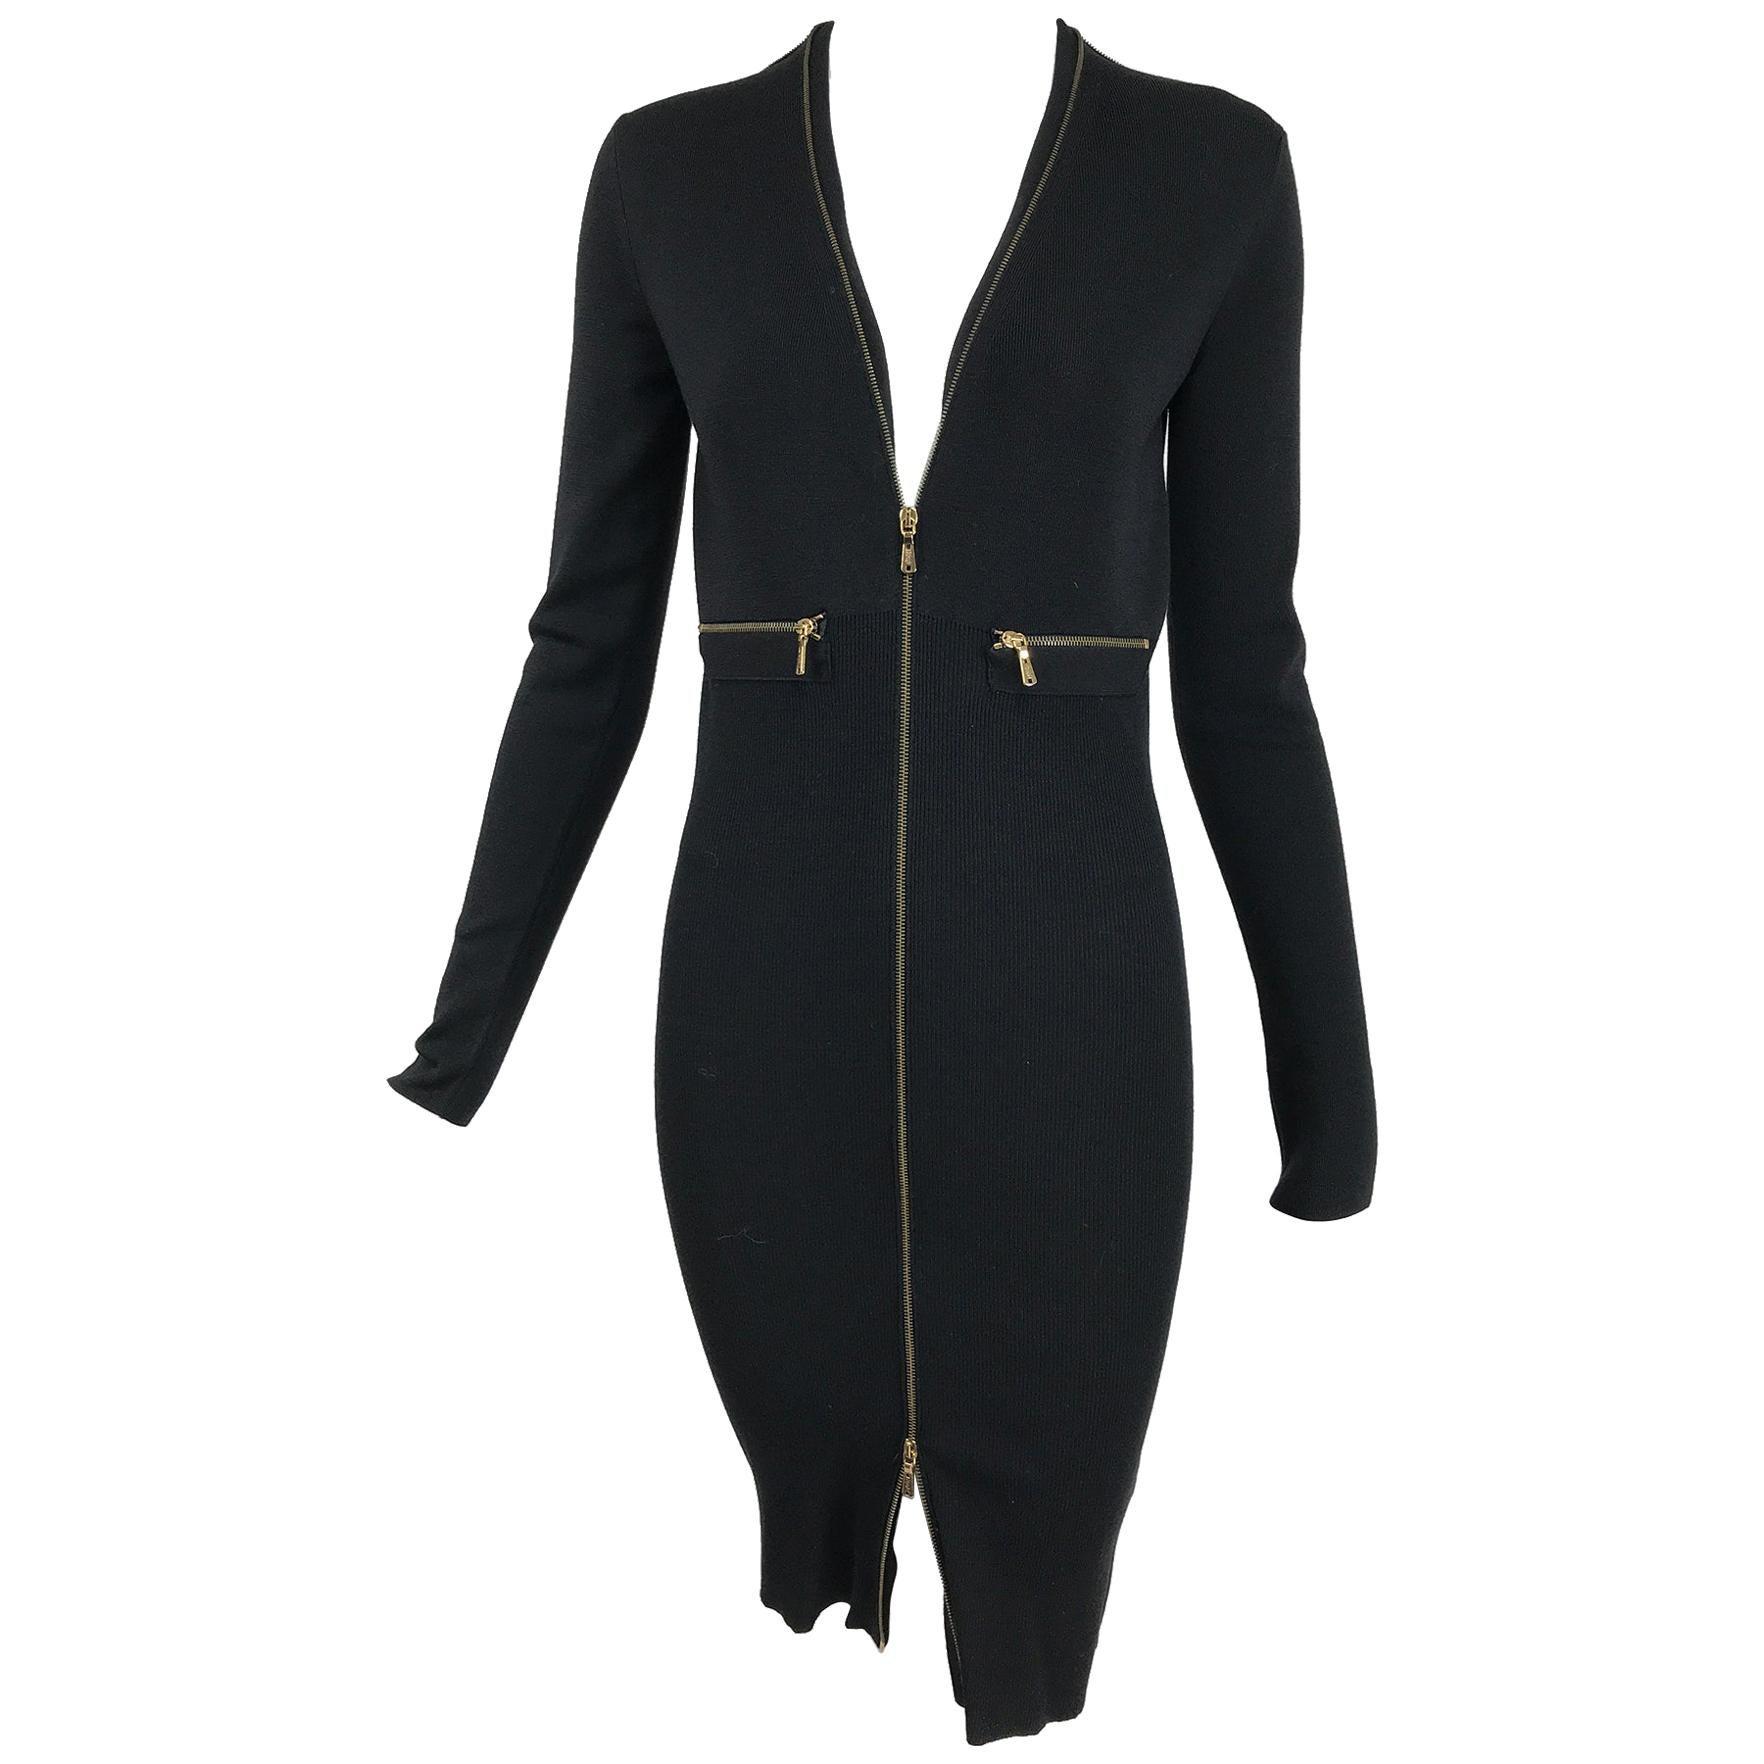 Yves Saint Laurent Autumn/Winter 2008 Ribbed Wool Zipper Front Body Con Dress